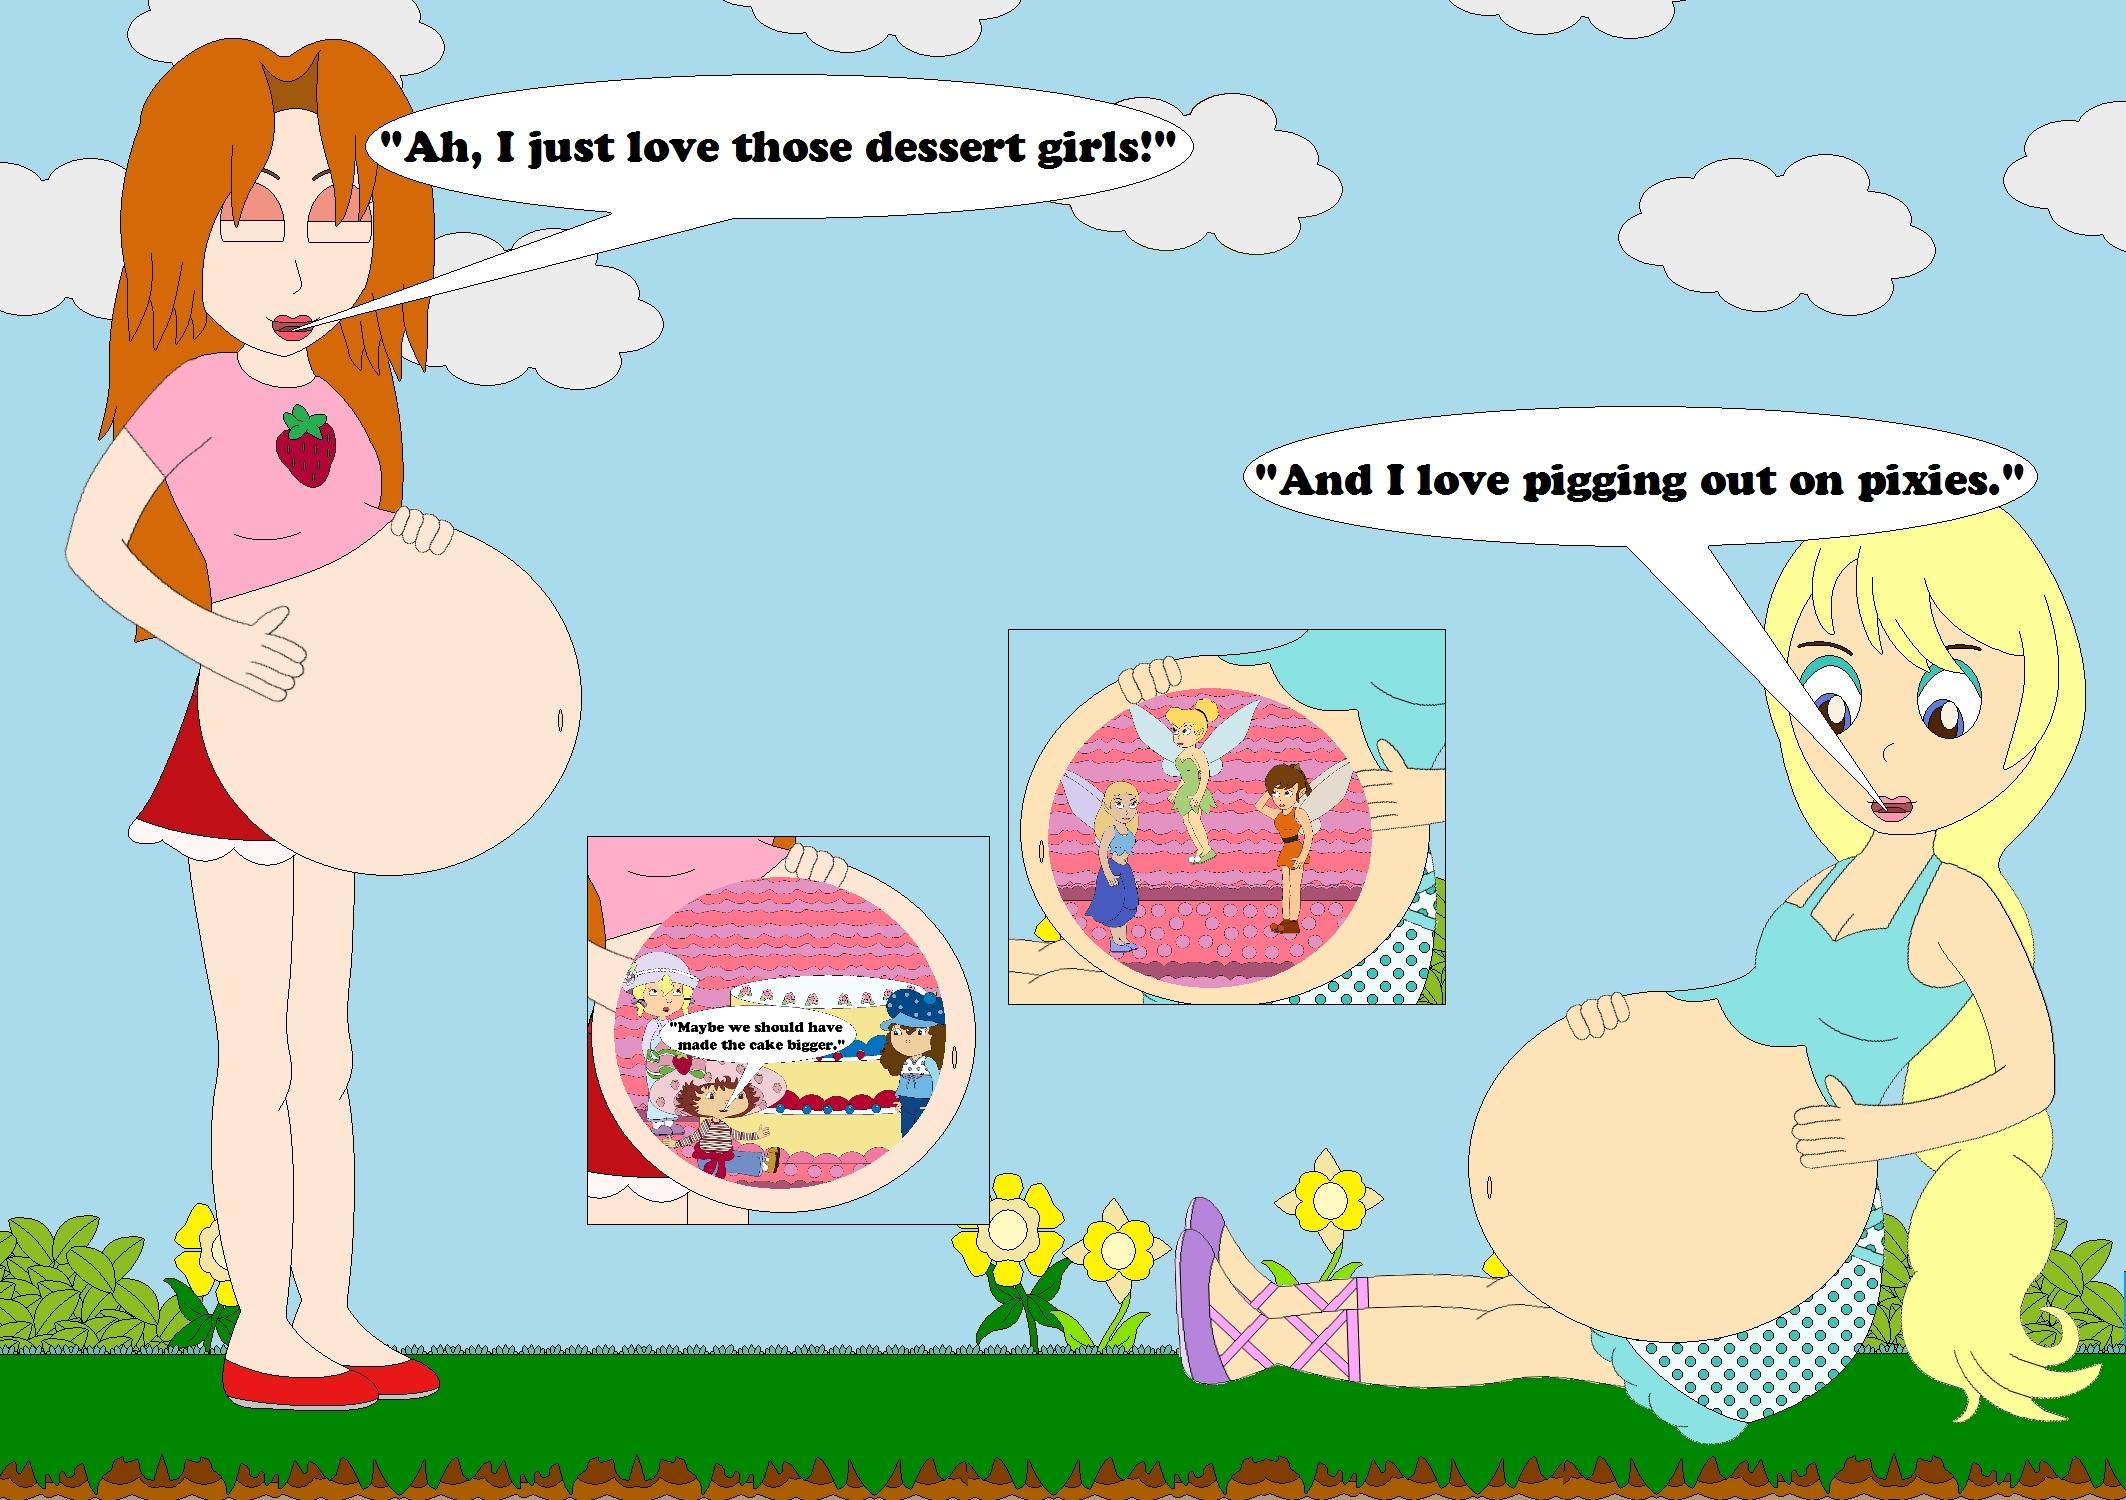 Giantess Tinkerbell in may and jill's snacktimekphoria on deviantart